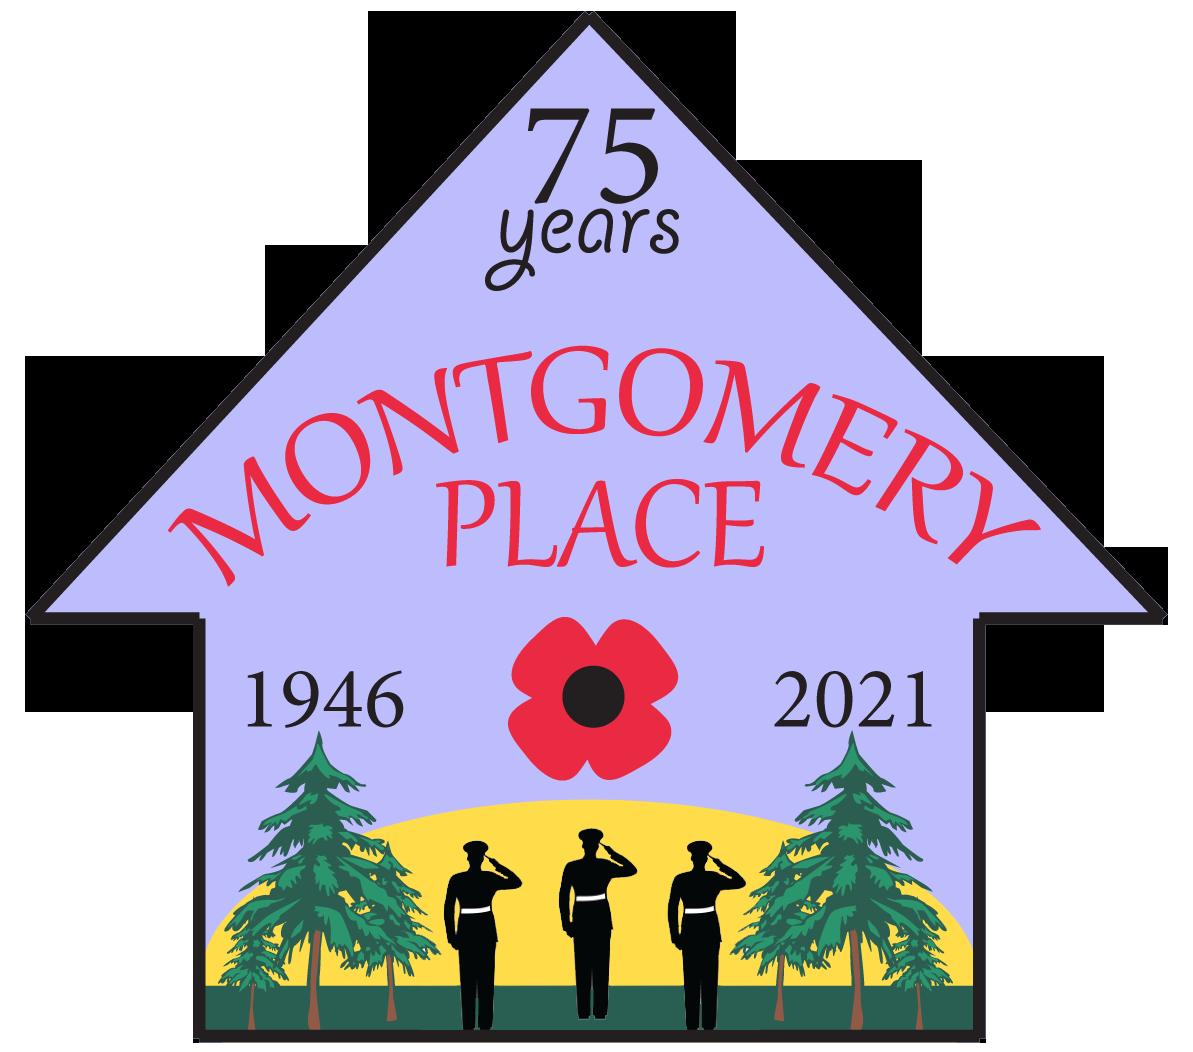 Montgomery Place Community Website